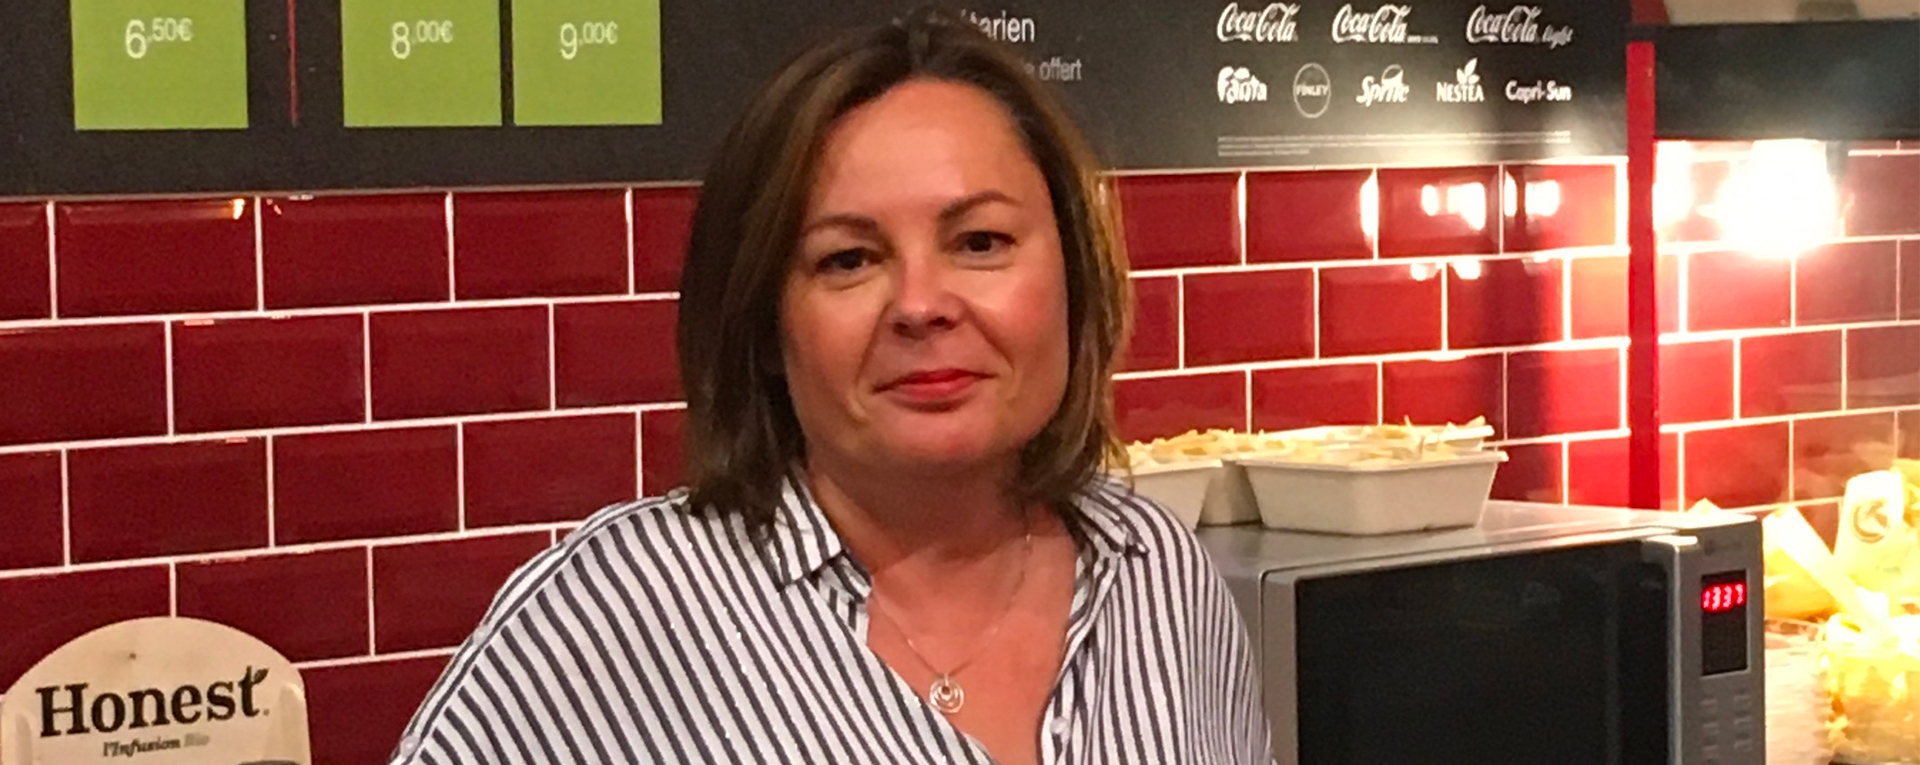 Karin Franchisée Nachos Rennes